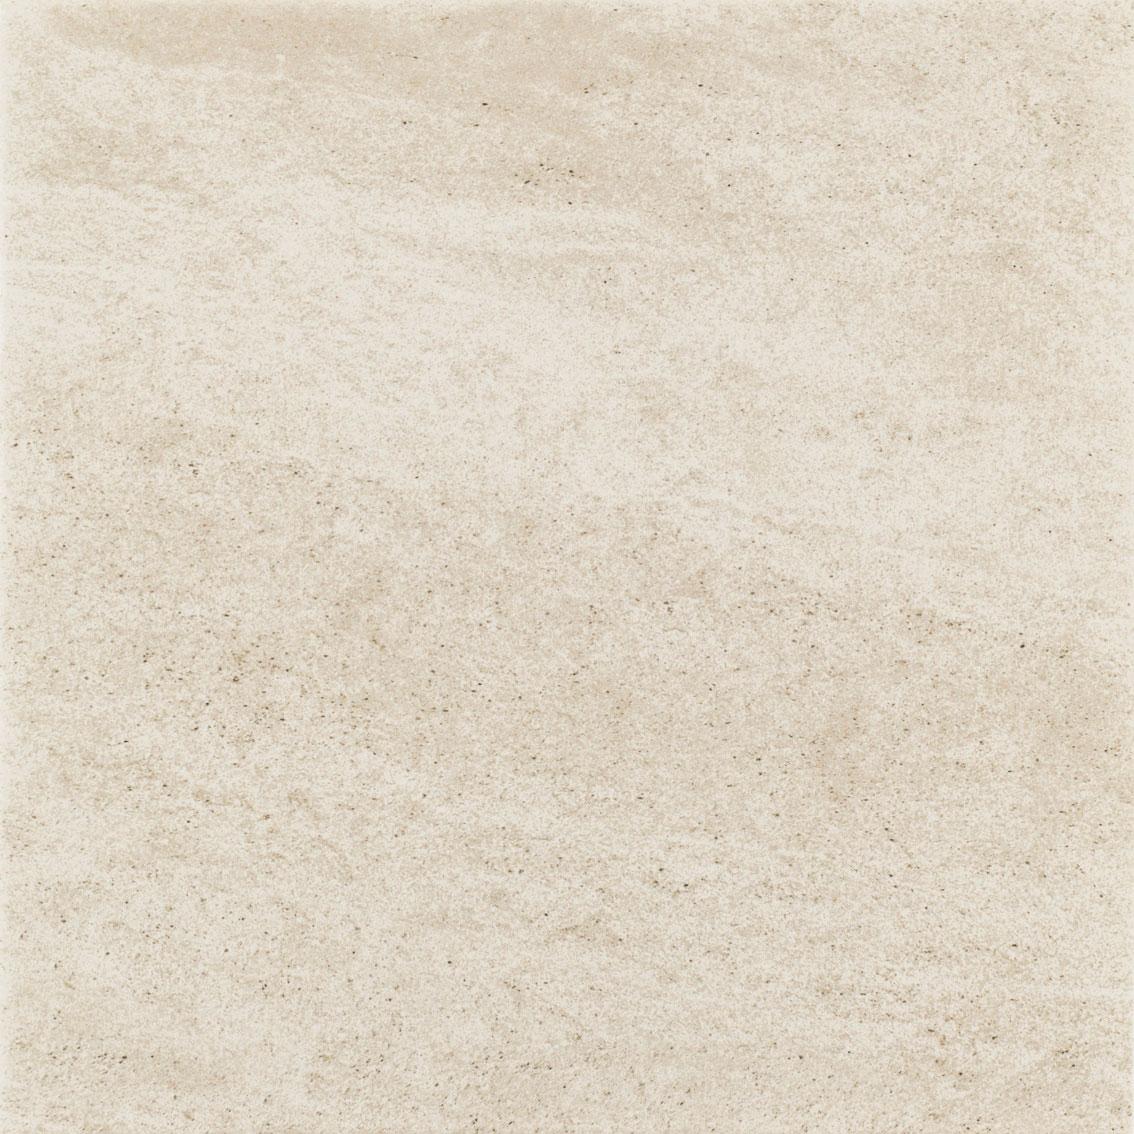 Напольная плитка Ceramika Paradyz Milio Beige 40x40 (1,6) бордюр paradyz emilly milio sepia 2 3x60